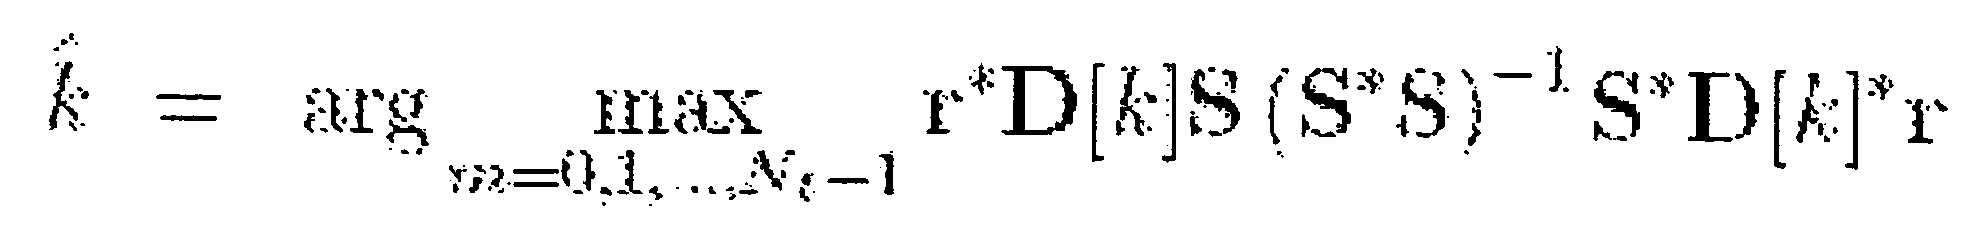 Figure 112015010005017-pat00109